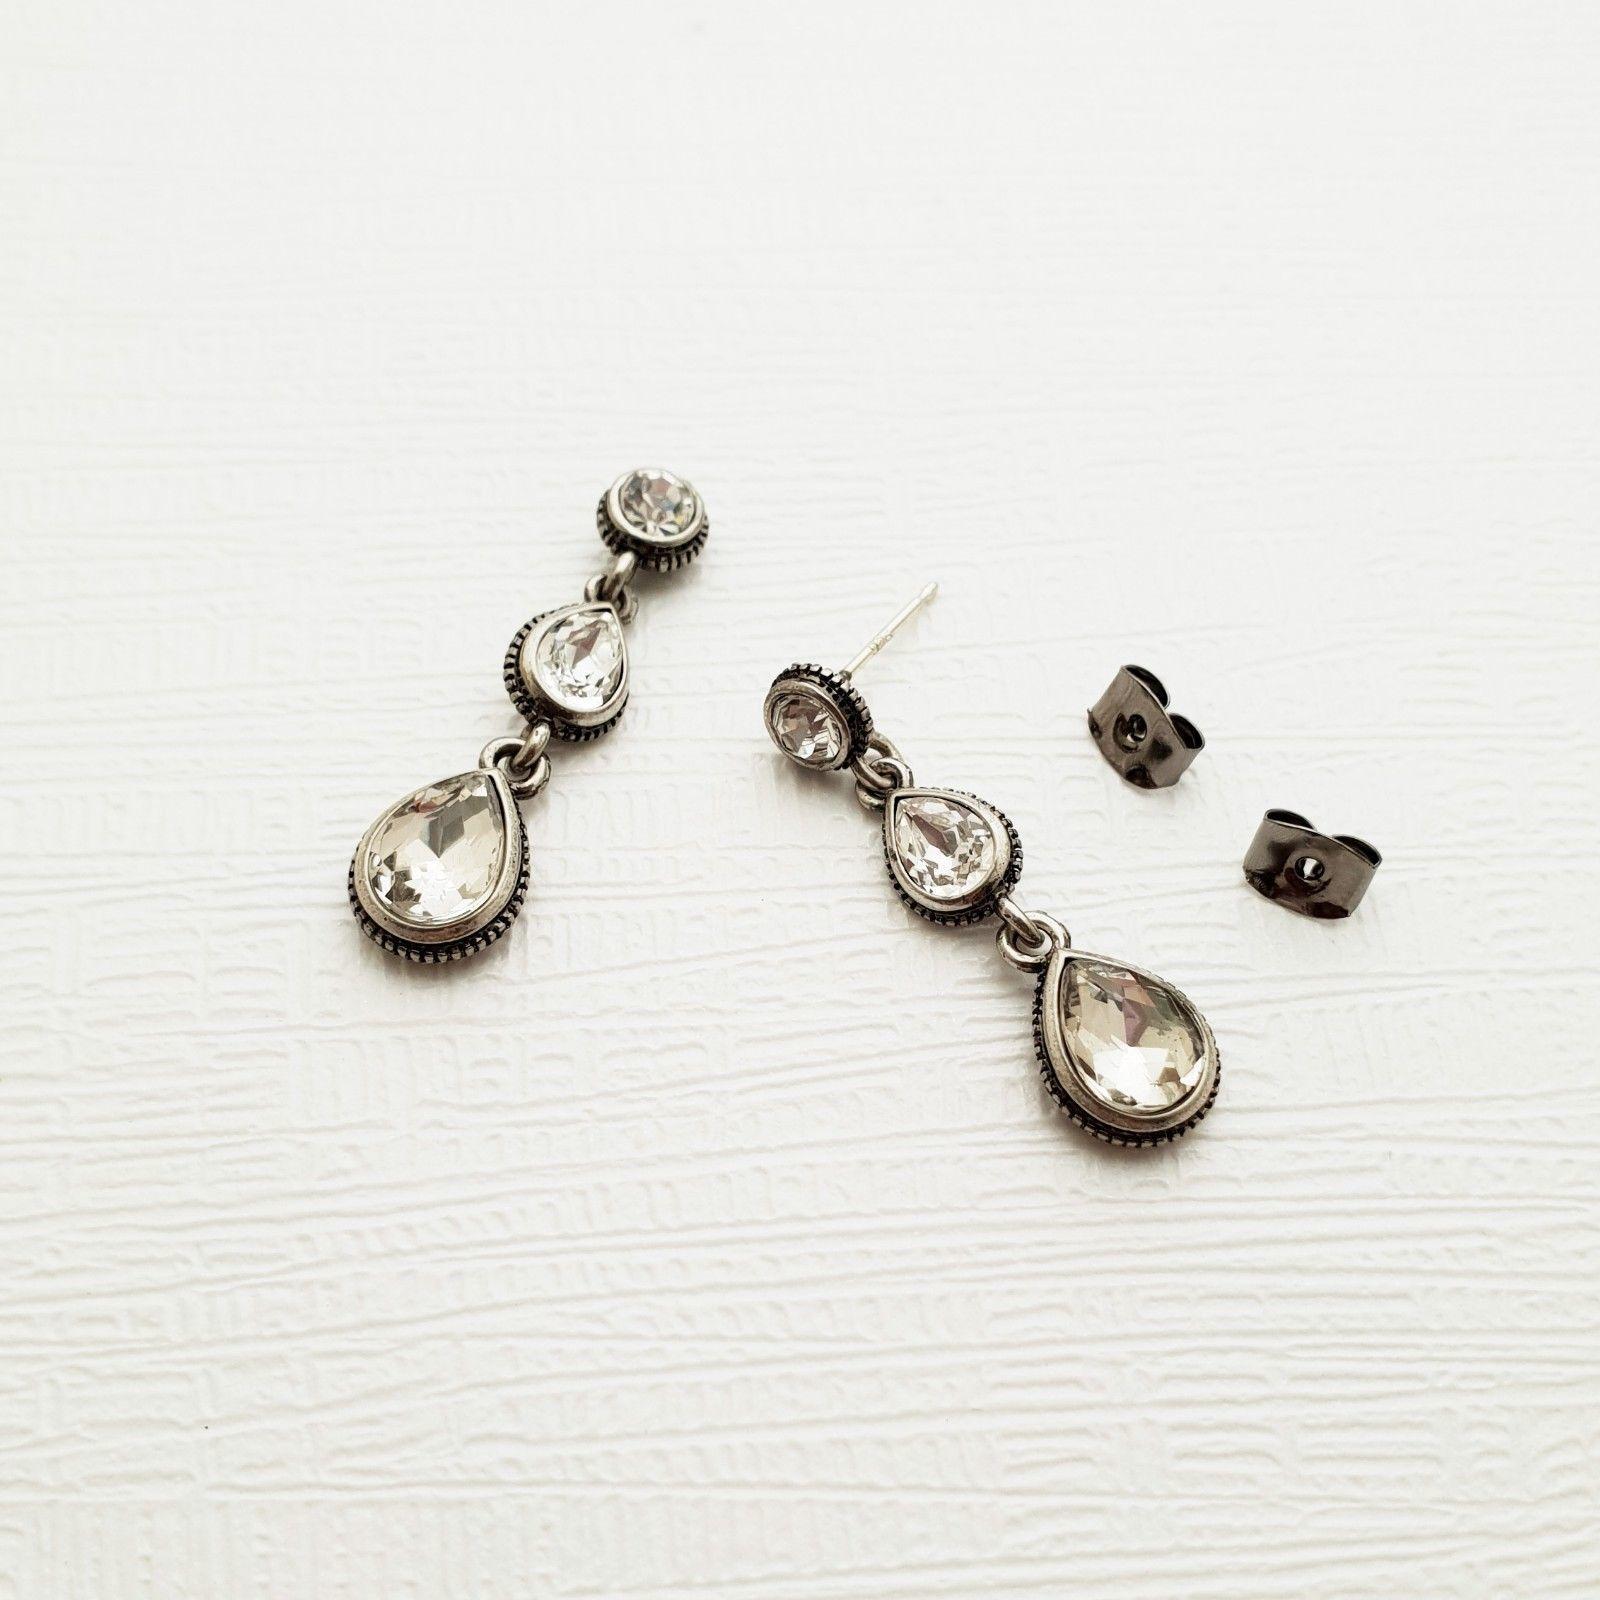 Tiered Round Water Drop Teardrop Shape Made With Swarovski Stone Dangle Earrings image 4